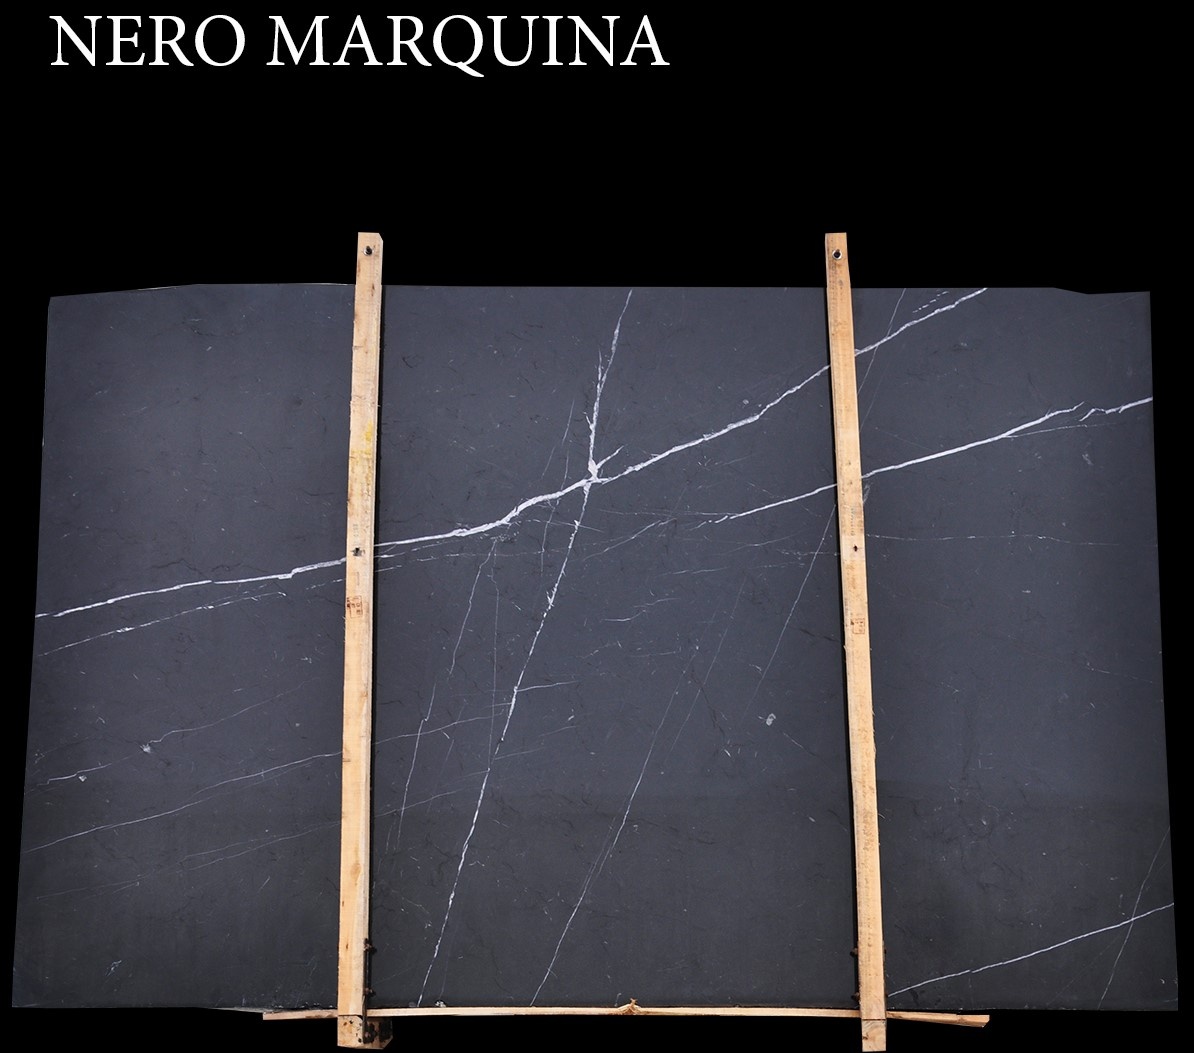 Nero Marquina Black Marble